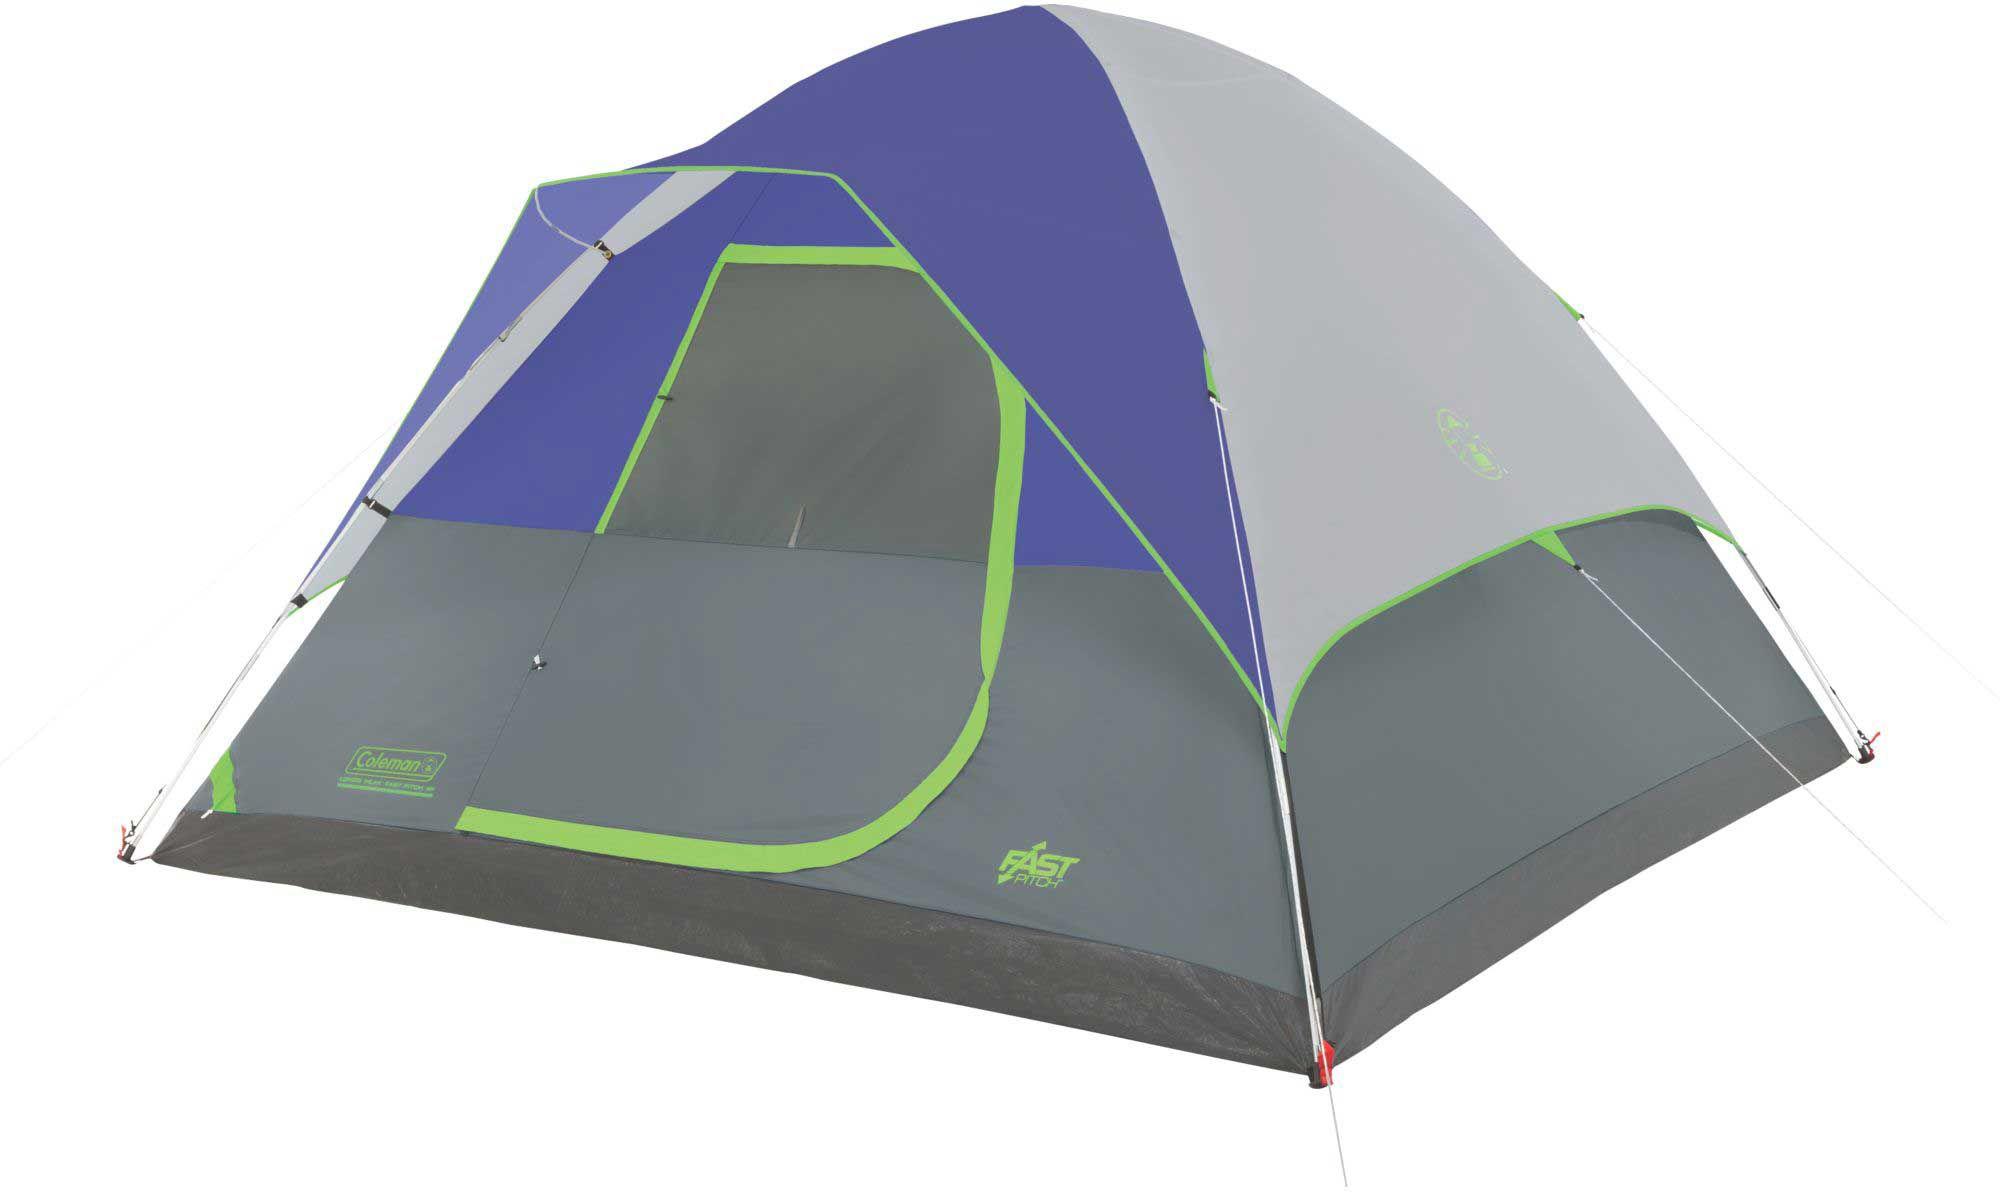 1  sc 1 st  DICKu0027S Sporting Goods & Coleman River Gorge Fast Pitch 6 Person Tent   DICKu0027S Sporting Goods